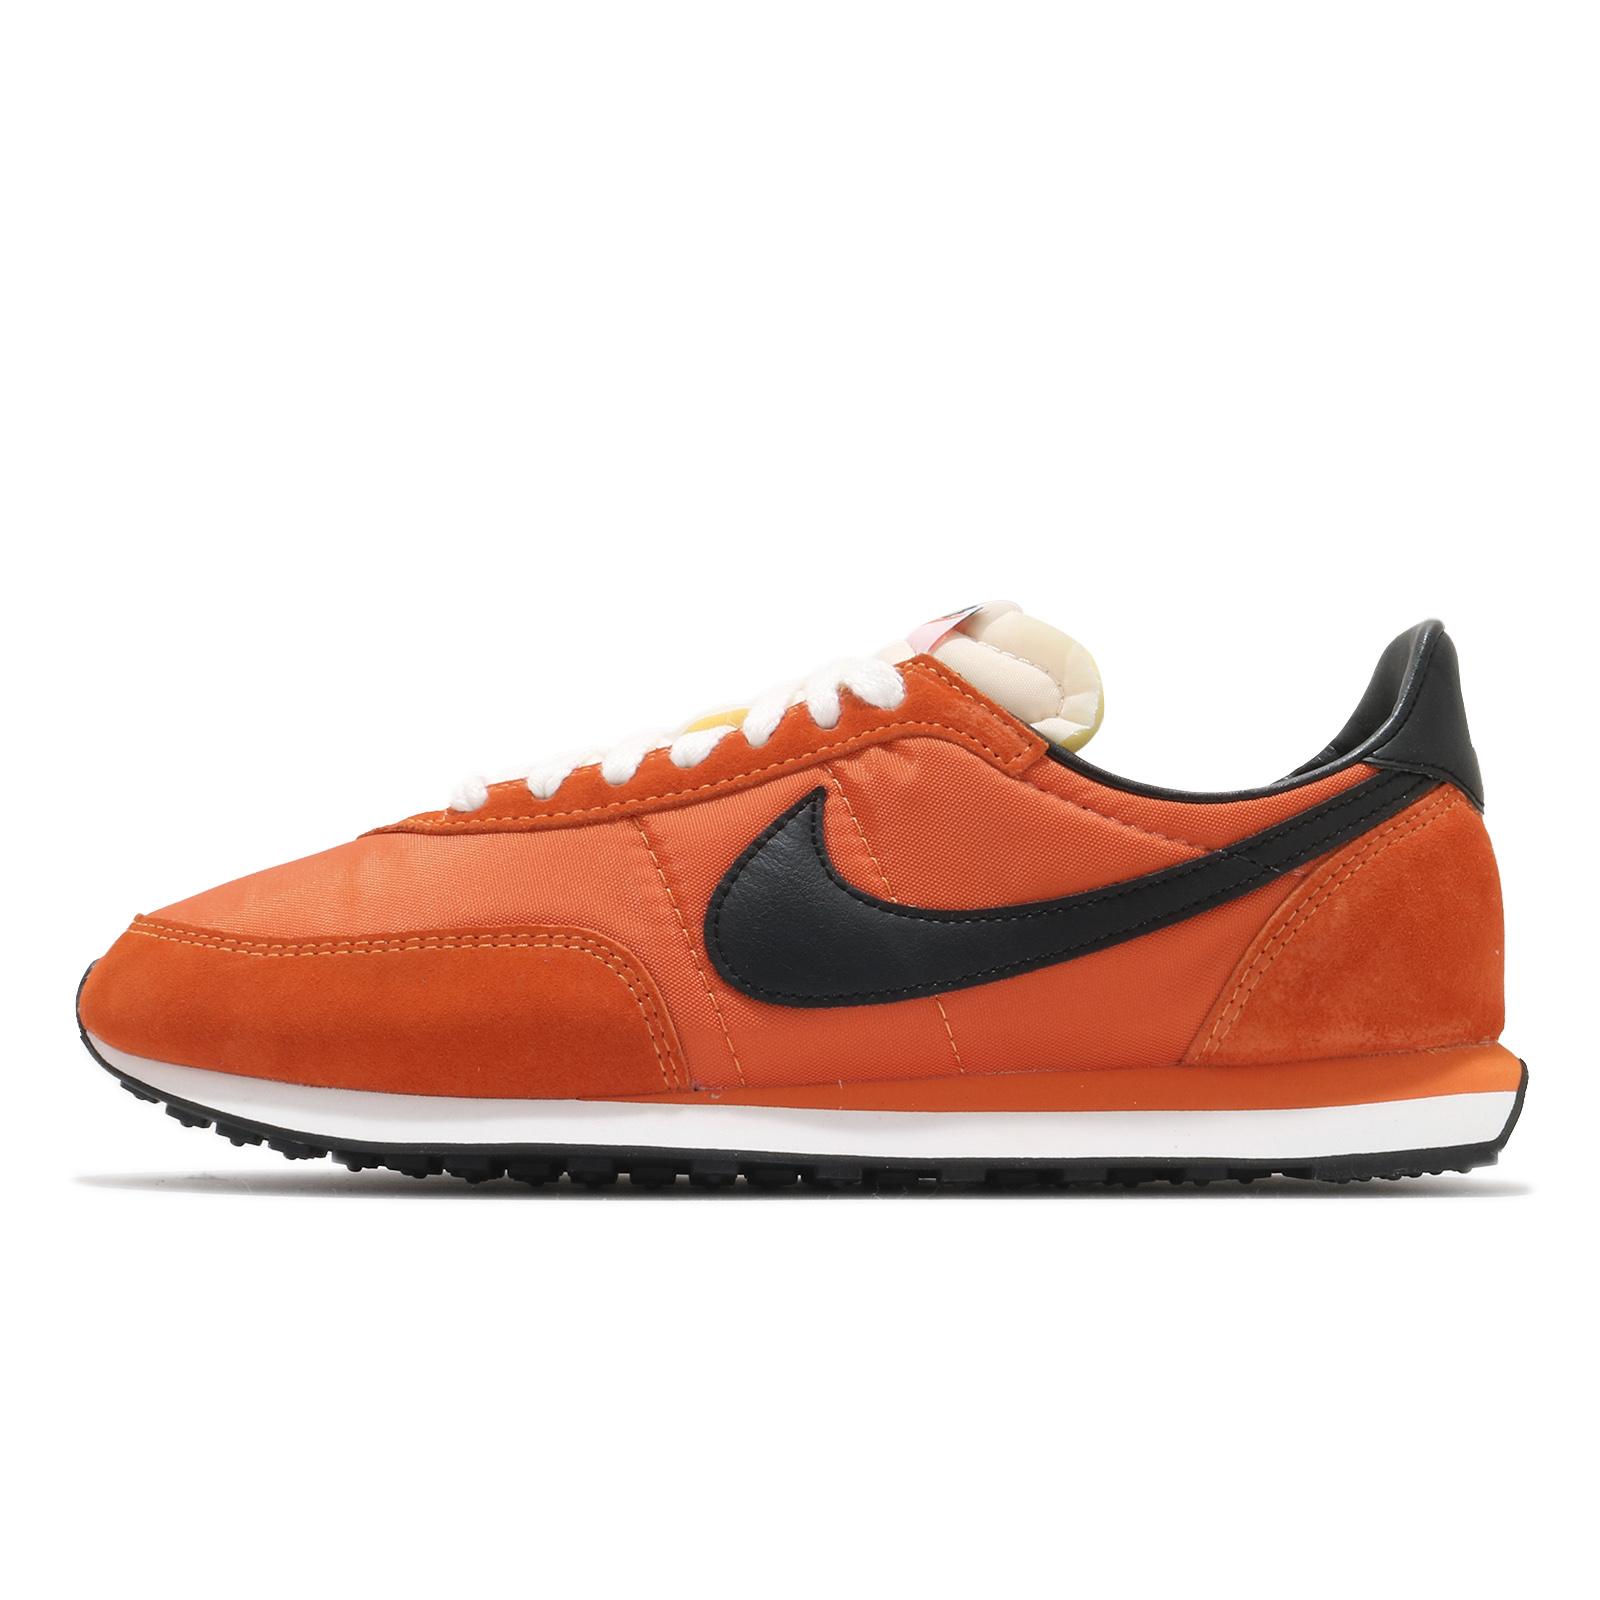 Nike 休閒鞋 Waffle Trainer 2 SP 橘 黑 男女鞋 復古慢跑鞋【ACS】 DB3004-800